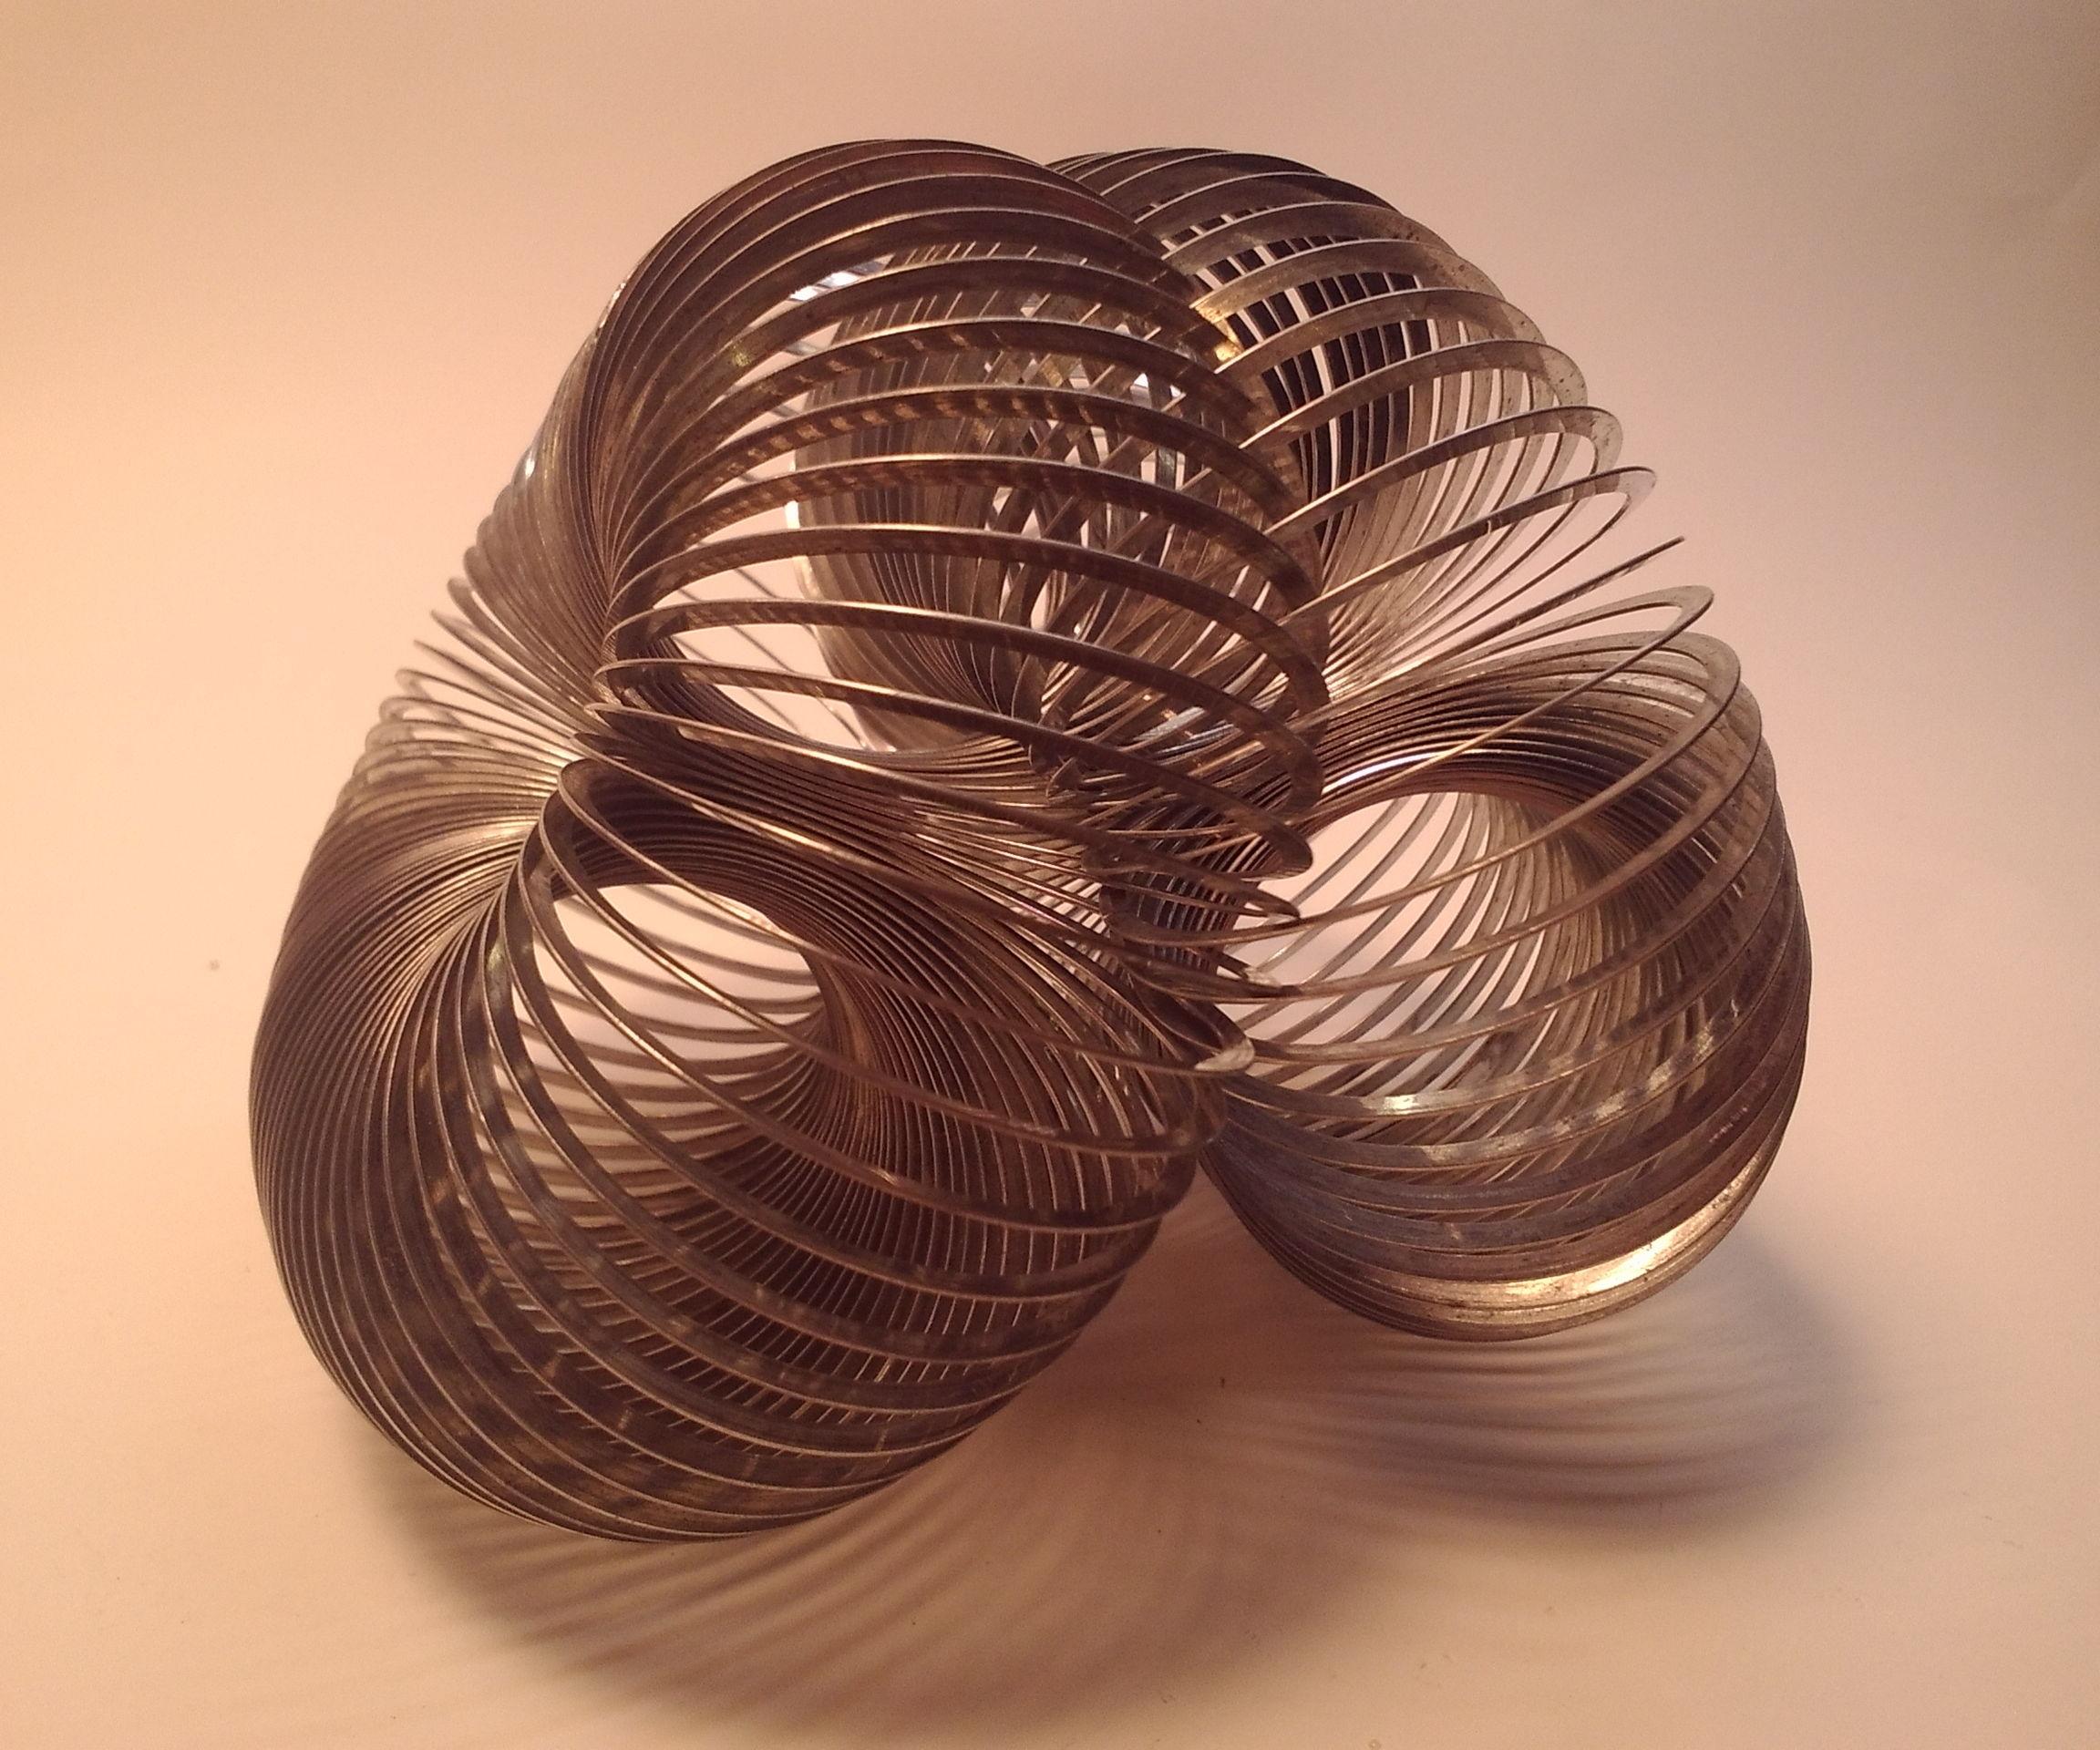 Chuck's Slinky Torus Design Challenge